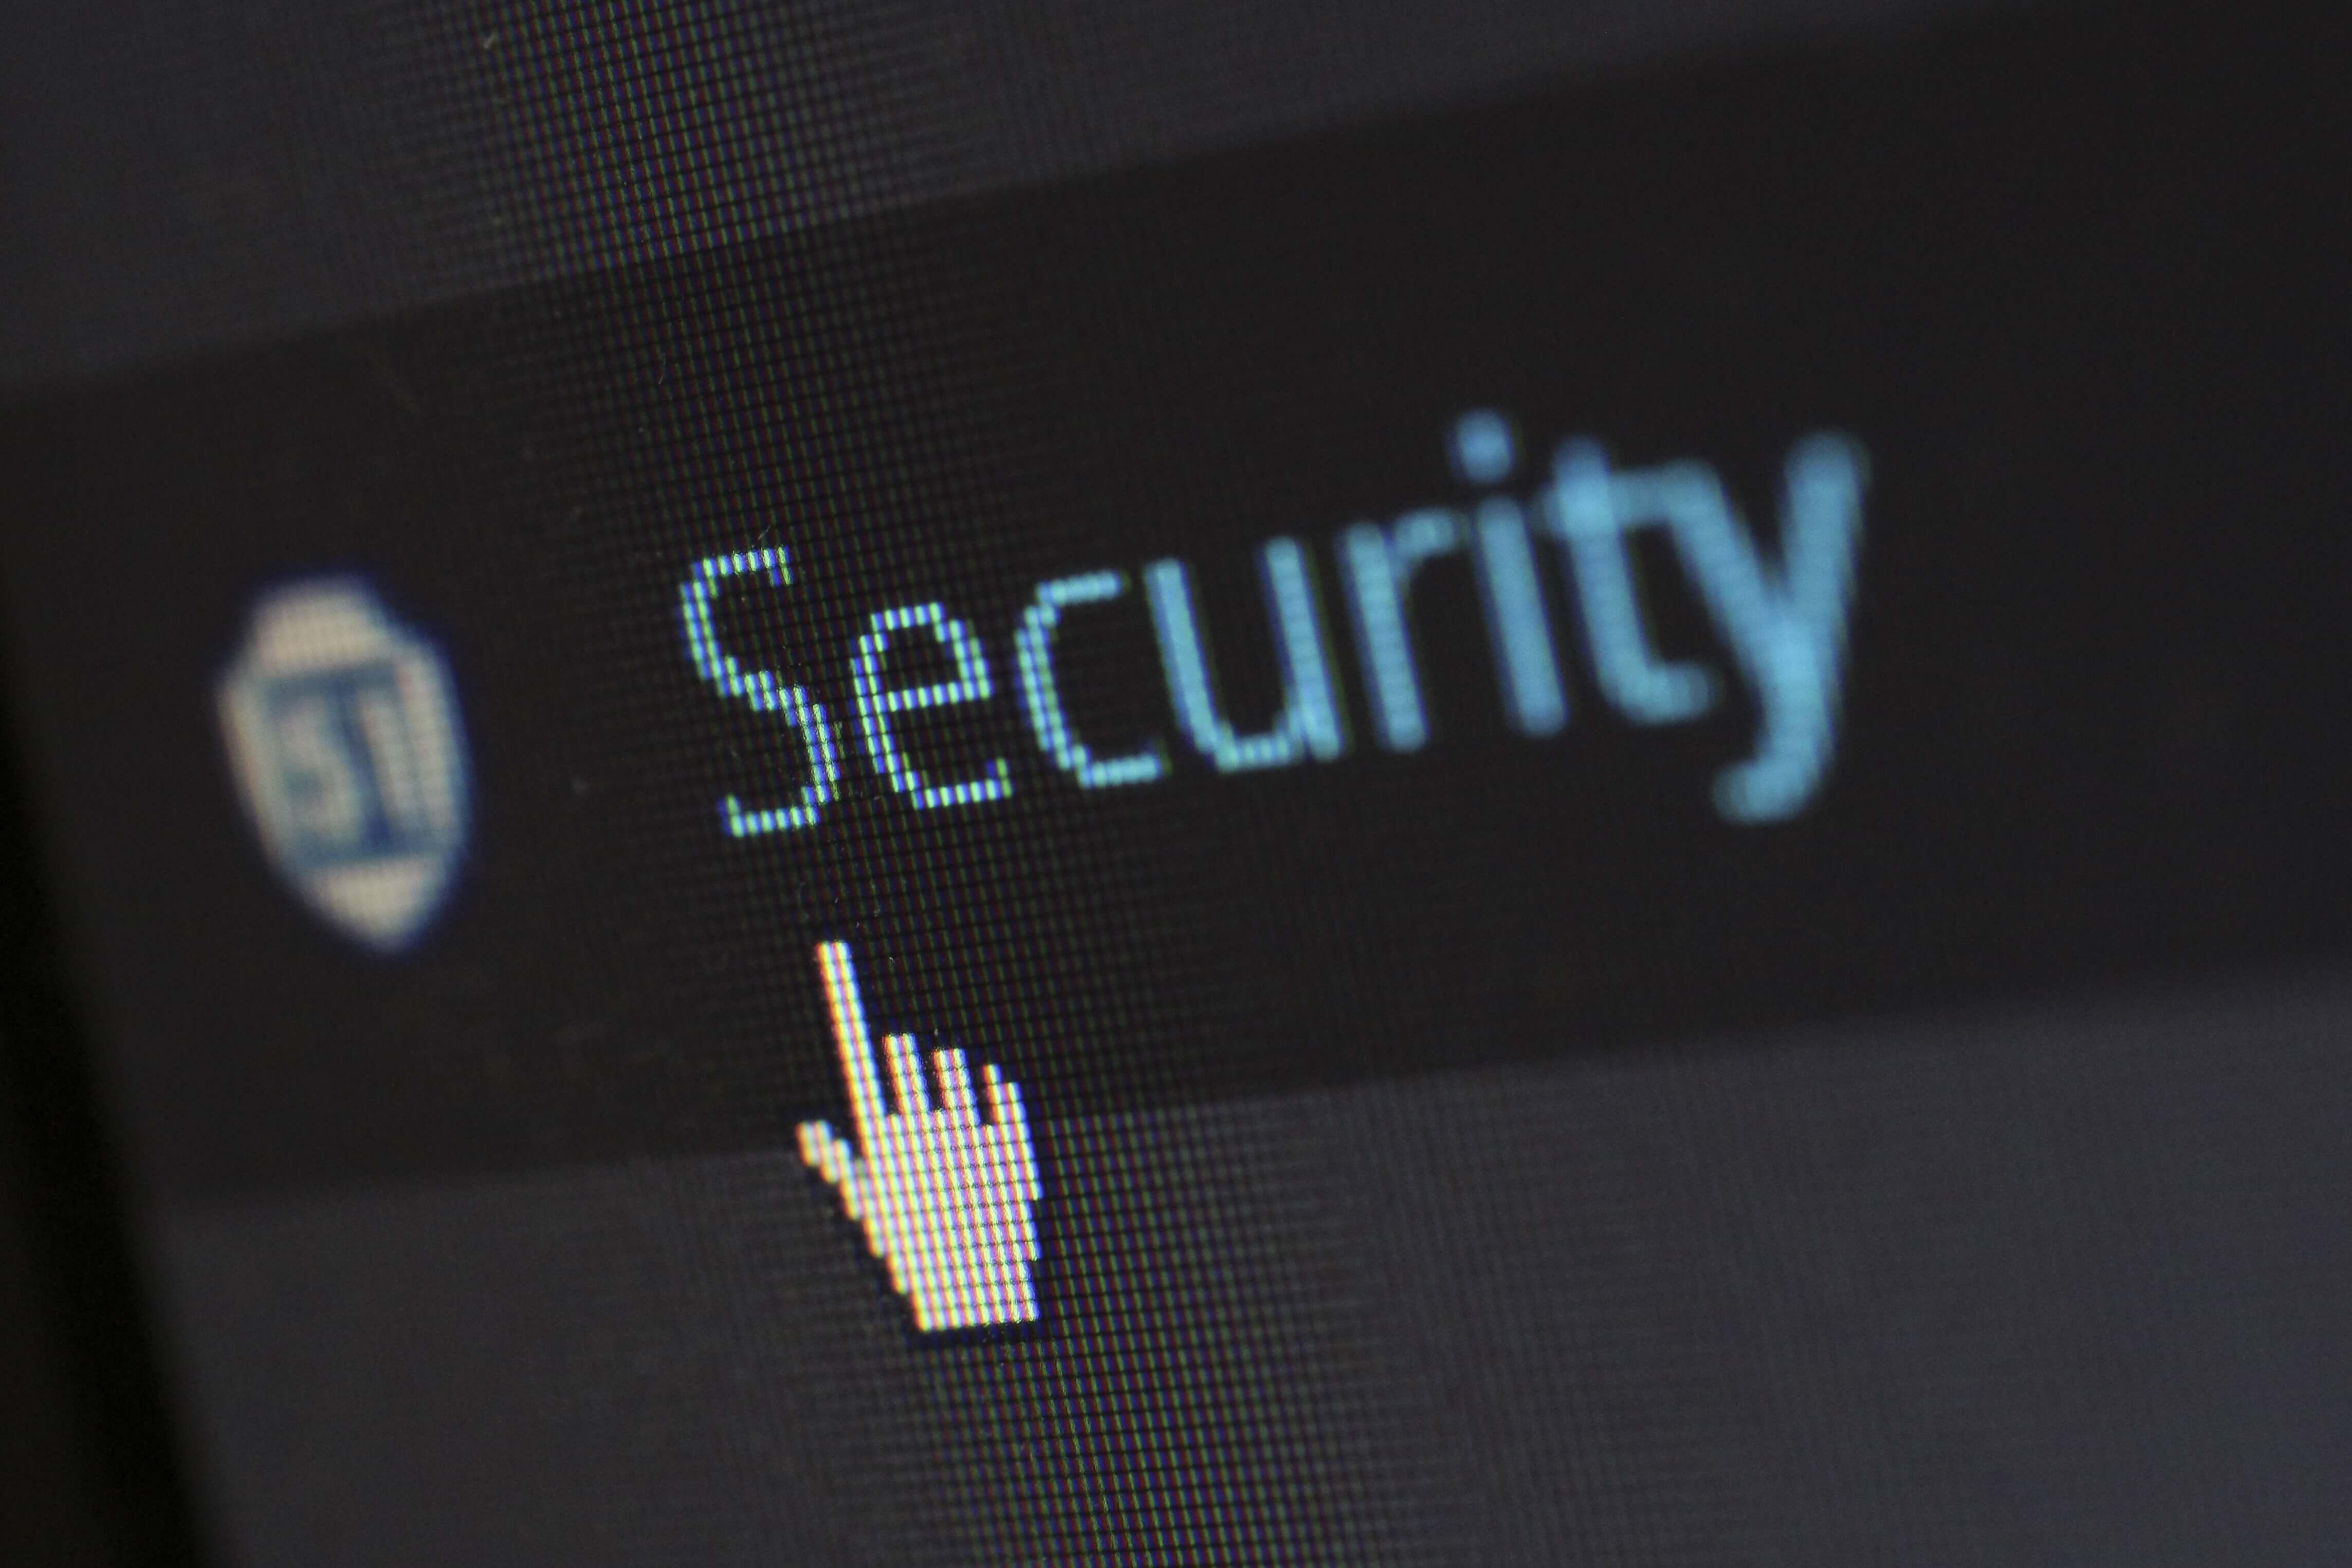 tien-beste-avg-privacy-ict-cursussen